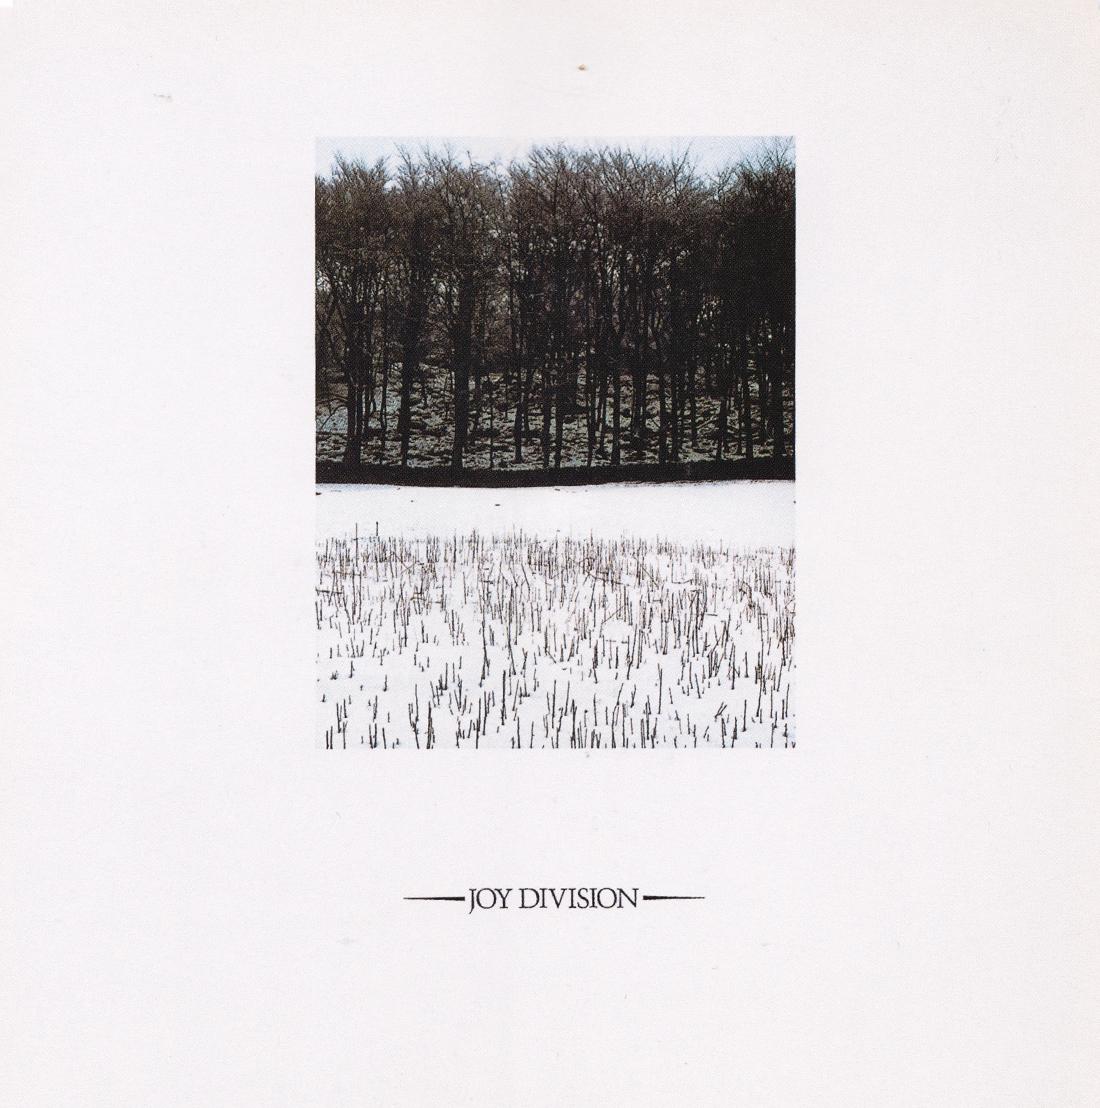 Factus 2 Joy Division Sh's Lost control, album, 1980, graphisme Peter Saville, photographie Charles Meecham